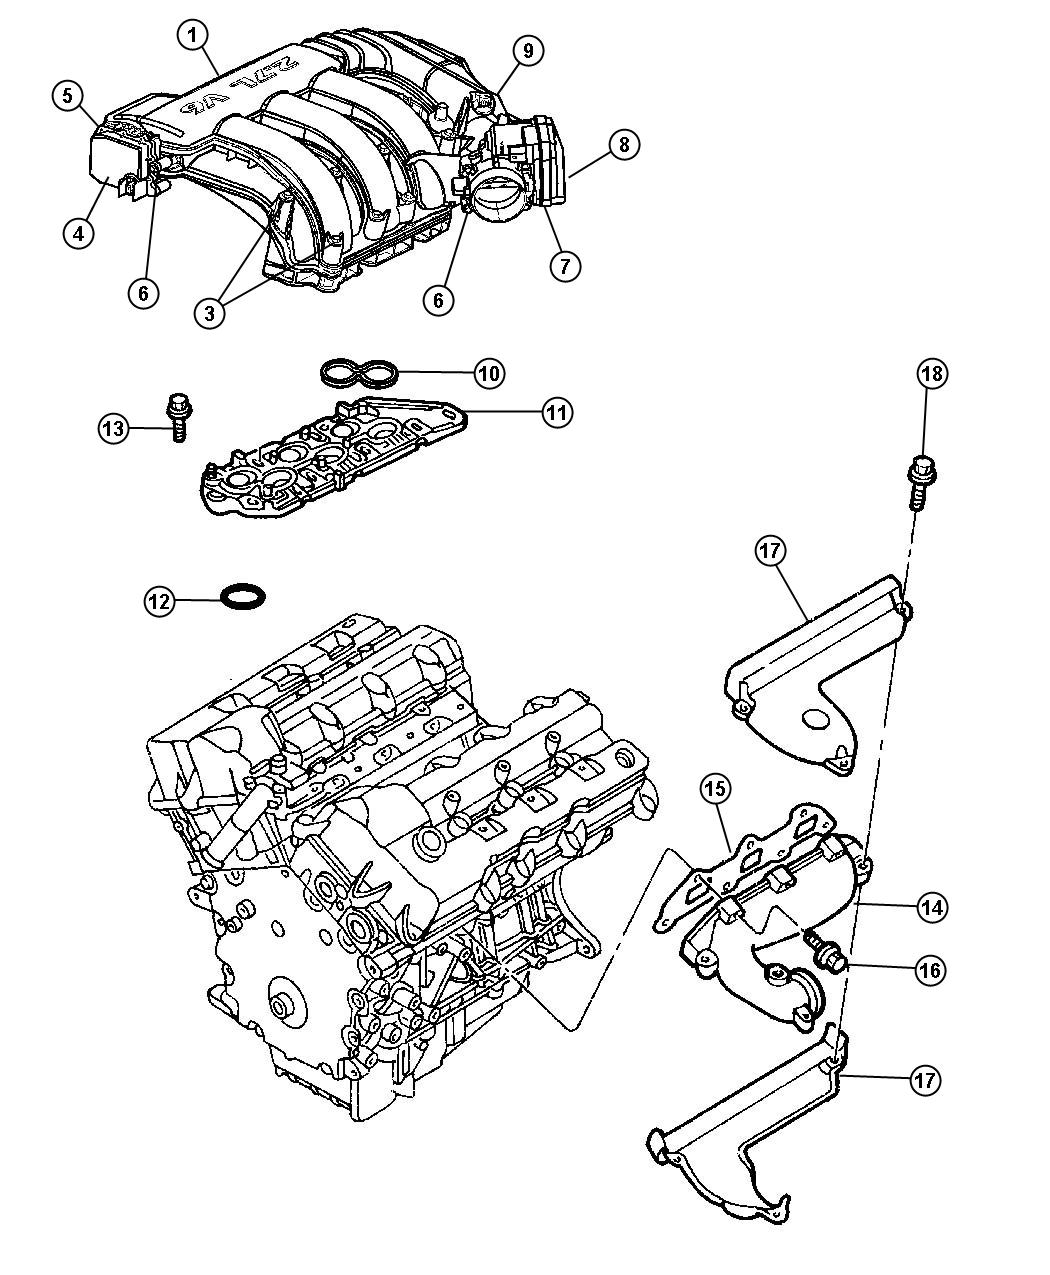 2005 Dodge Charger 2 7 Engine Diagram. 4578044ab genuine mopar support  engine support. 2008 chrysler 300 pad engine foam eer intake manifold. 2005  dodge magnum pump engine oil mega cab quad cab.2002-acura-tl-radio.info